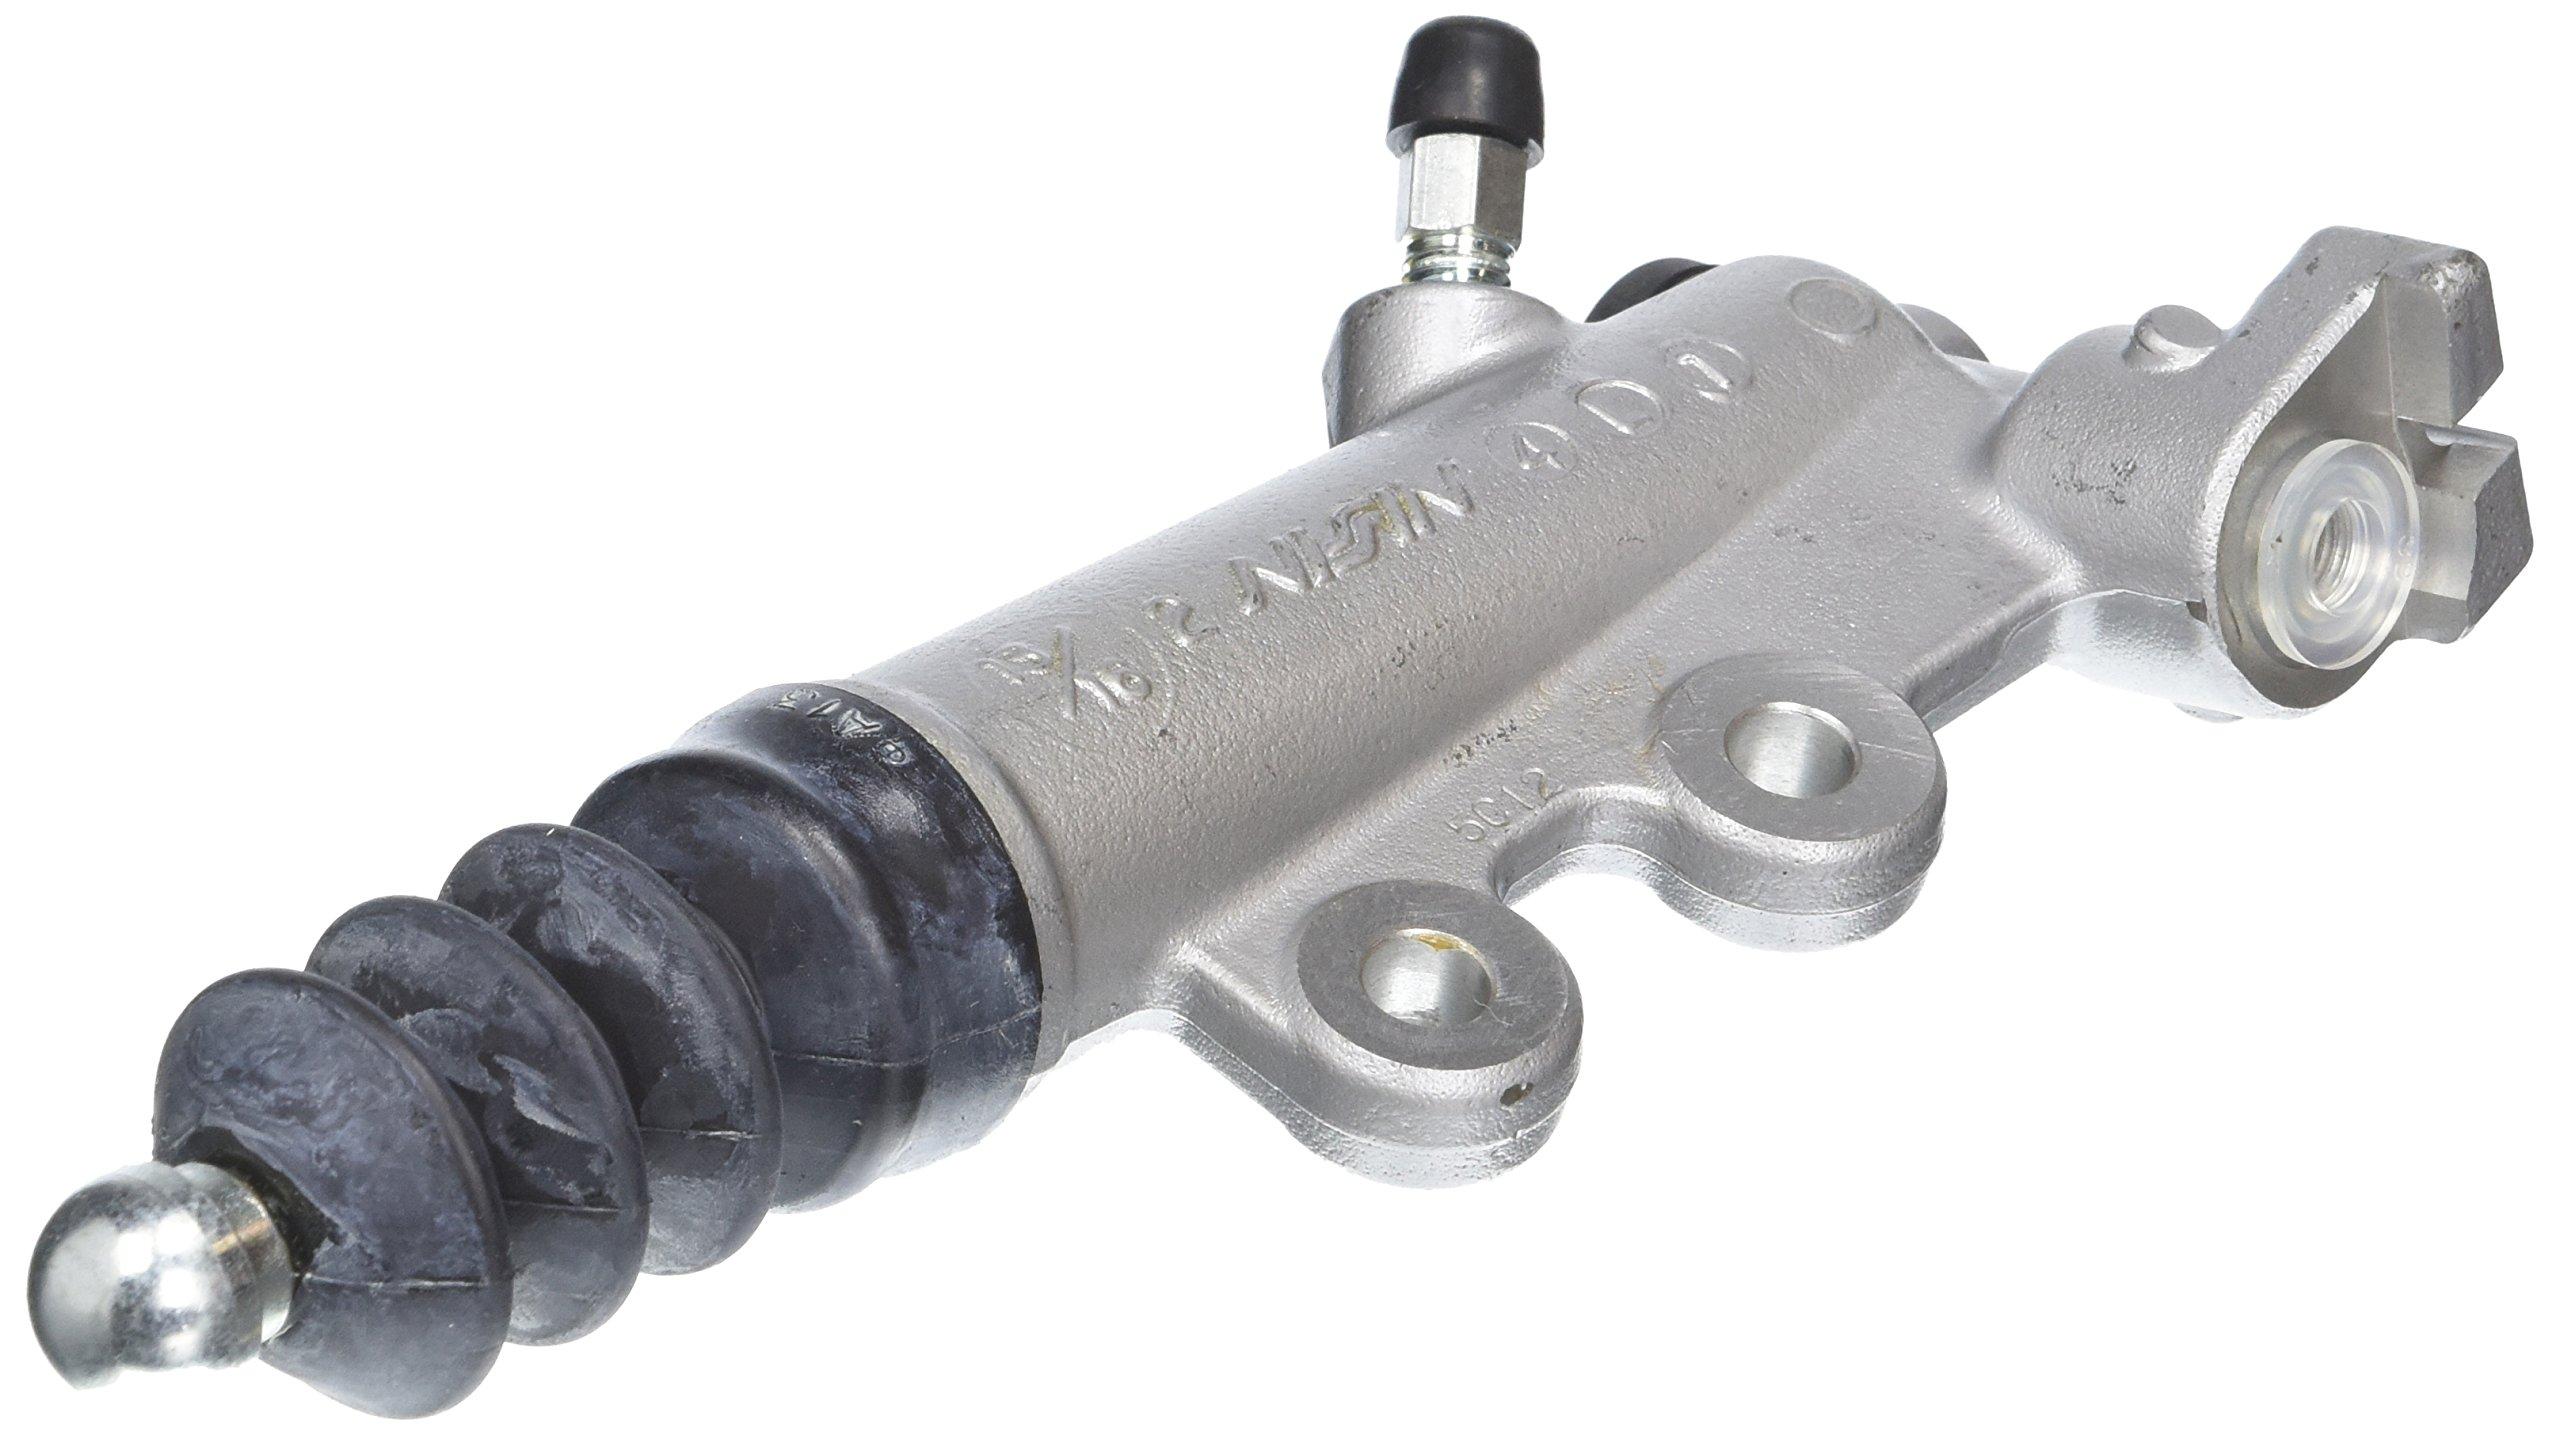 Genuine Honda 46930-S2A-A02 Clutch Slave Cylinder Assembly